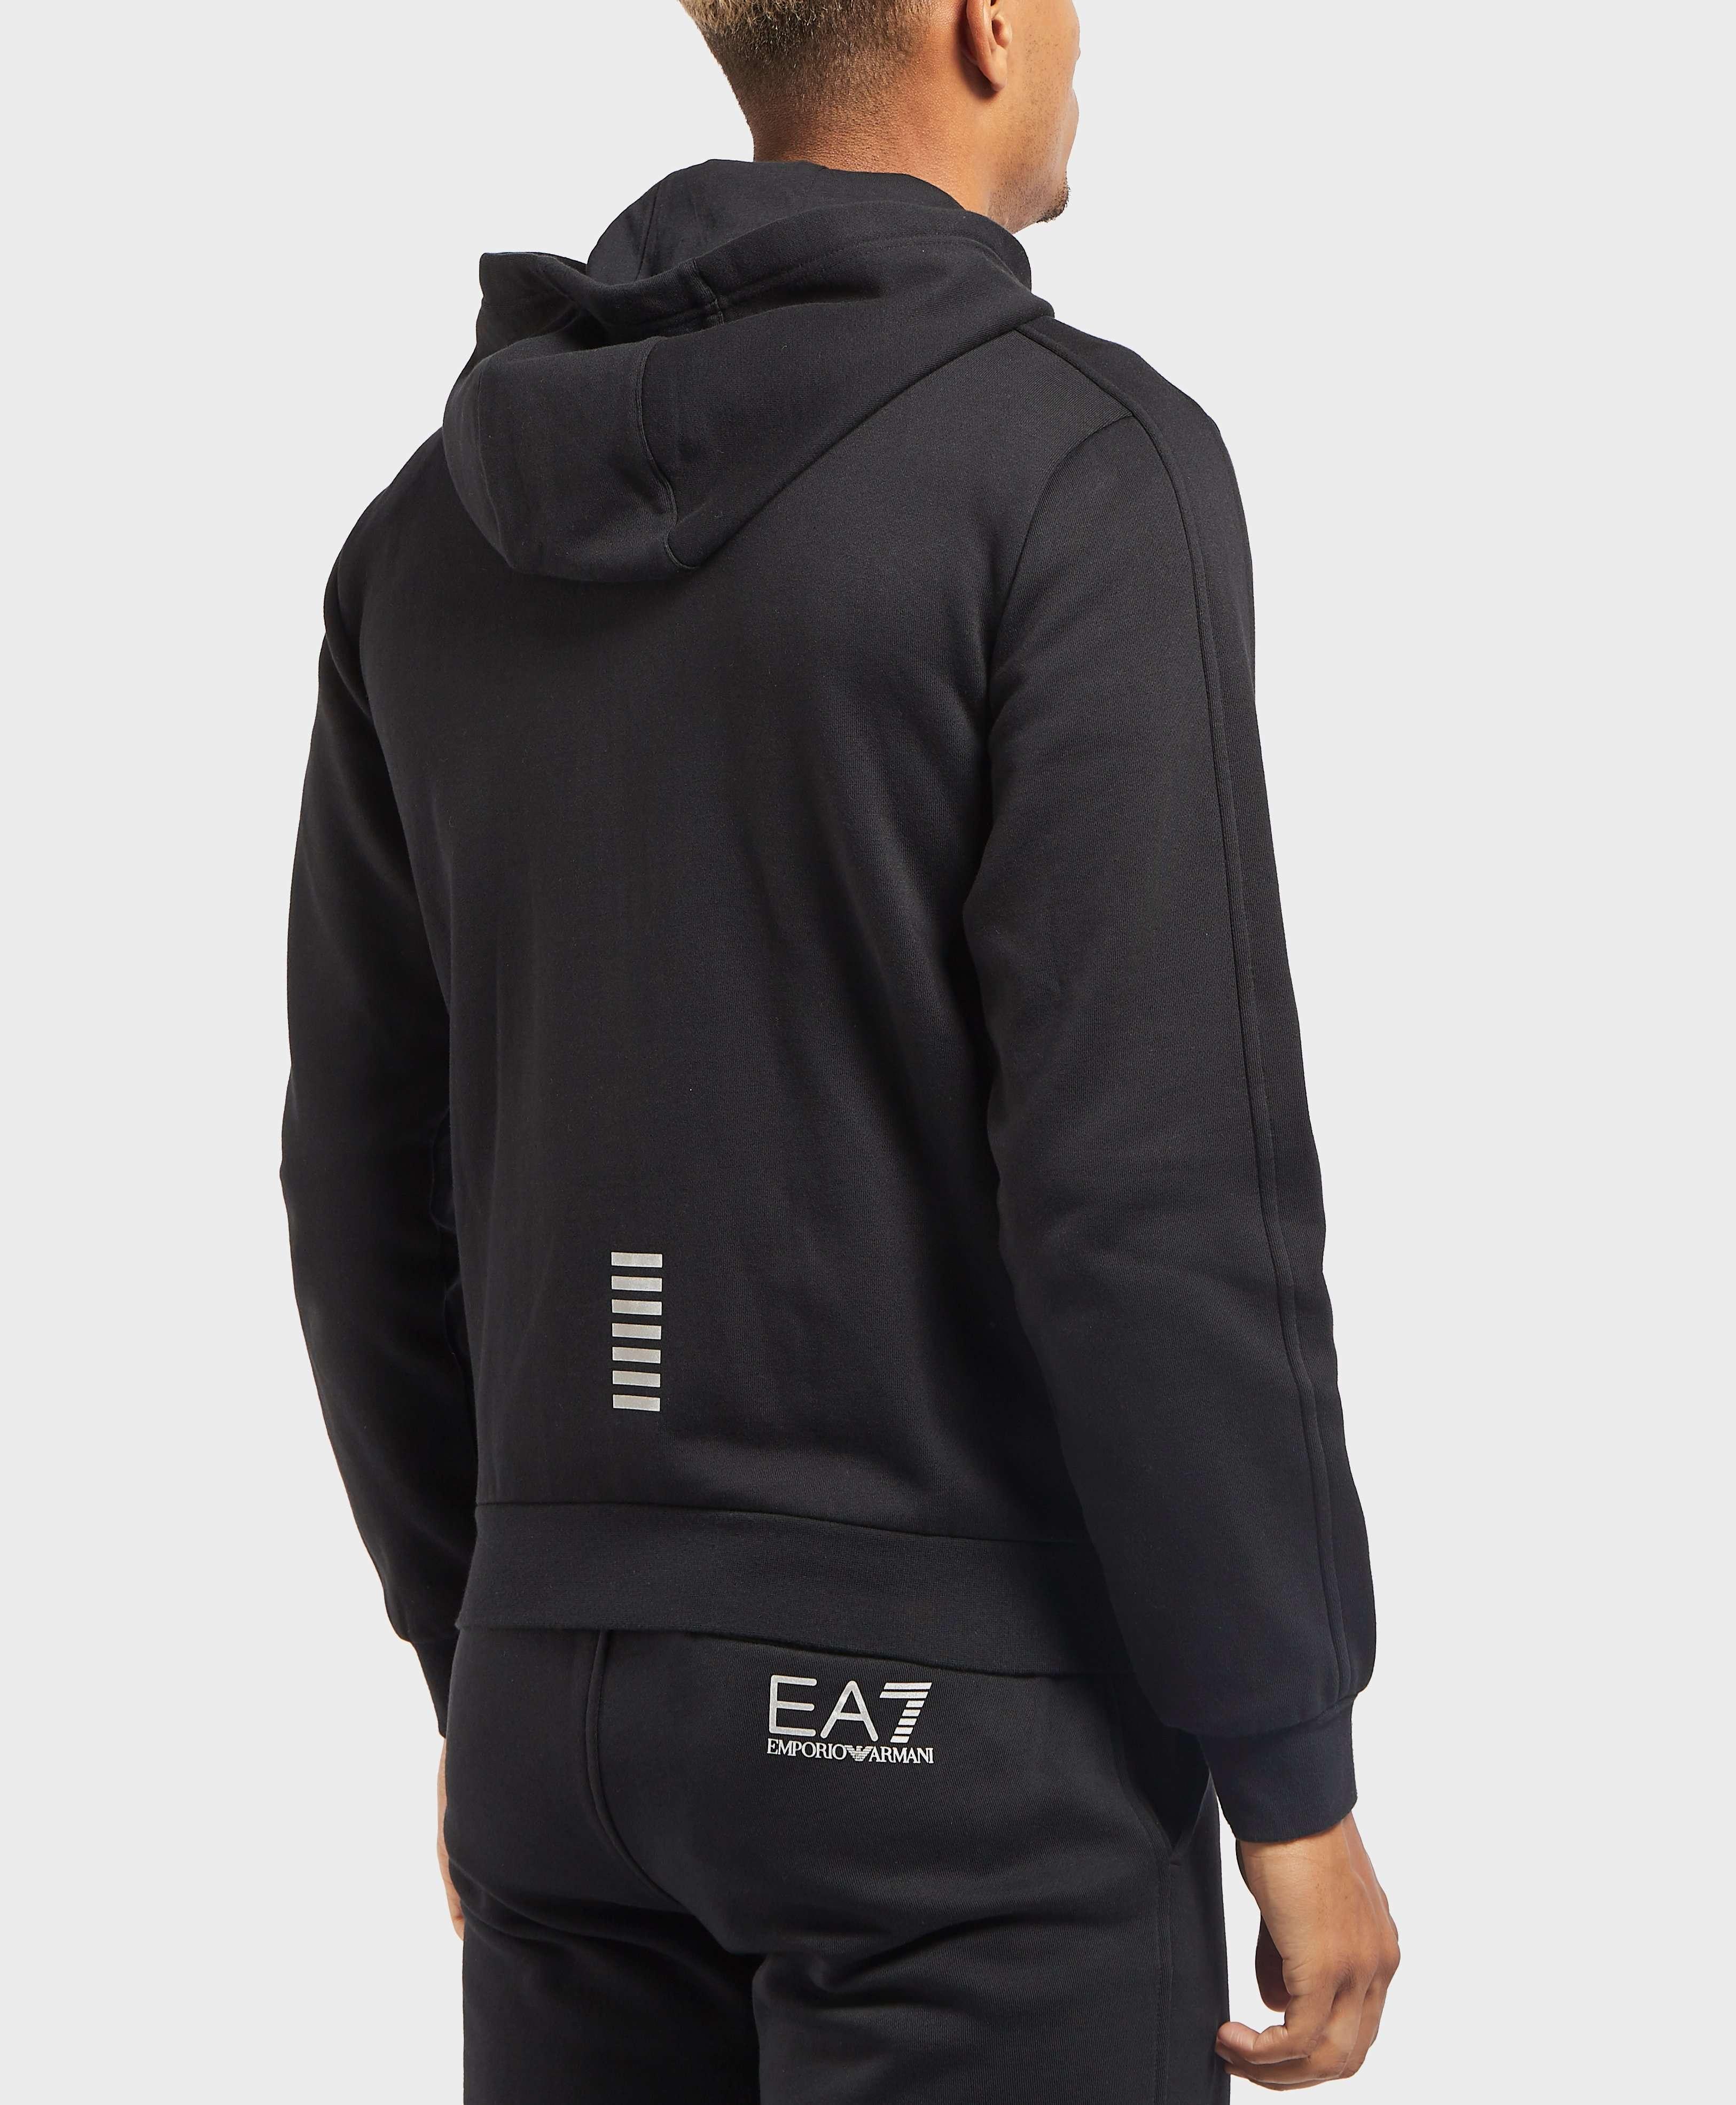 Emporio Armani EA7 7 Lines Full Zip Hoodie - Exclusive